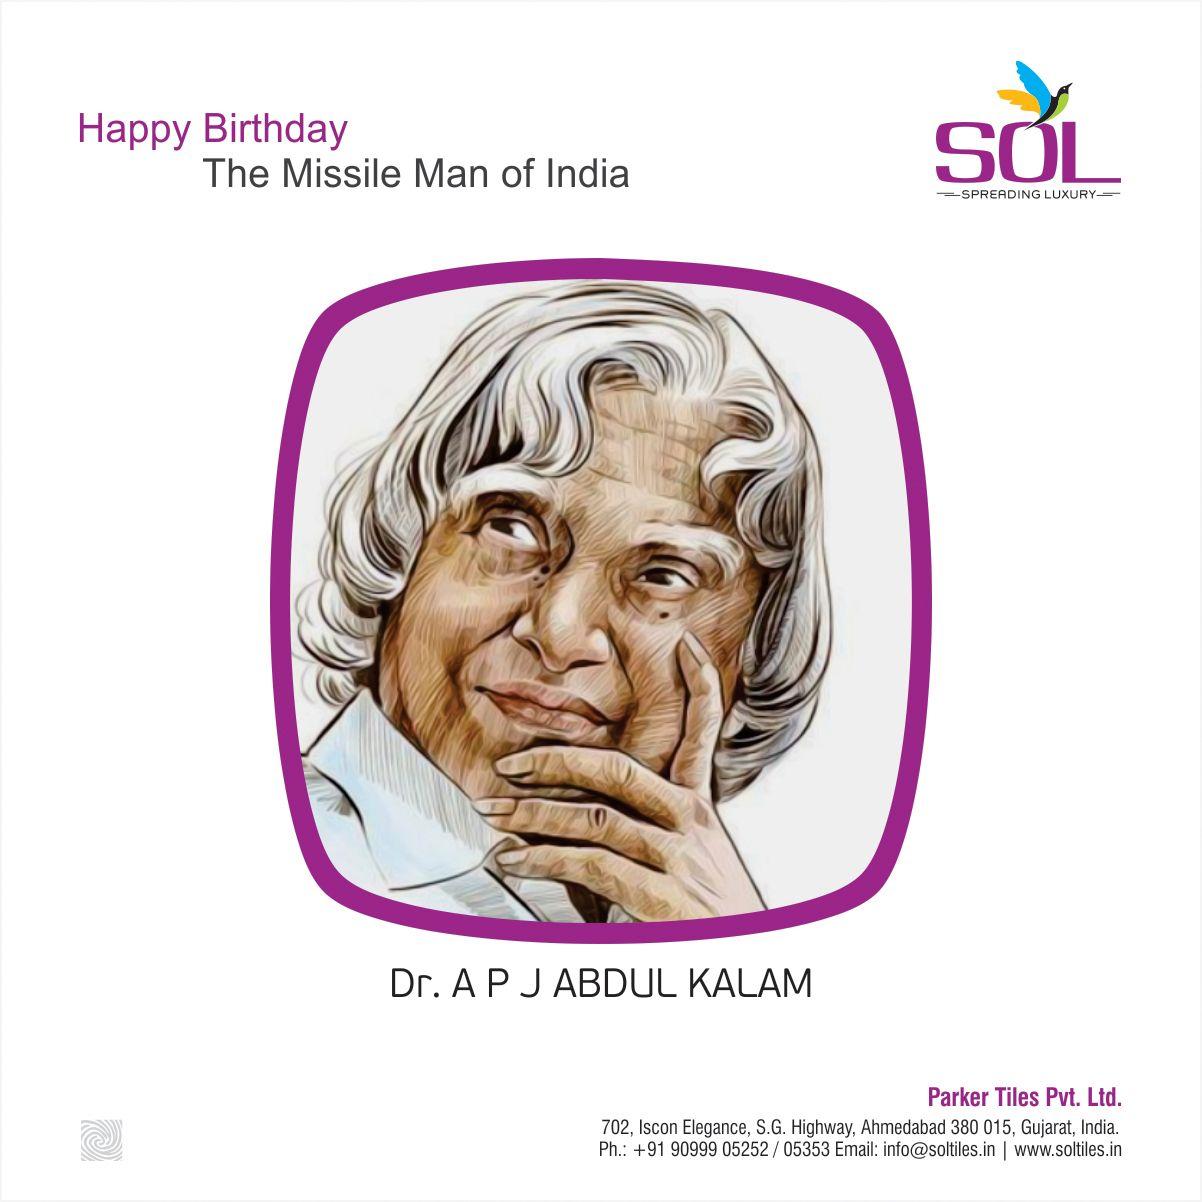 Happy Birthday to Missile Man of India abdulkalam happy